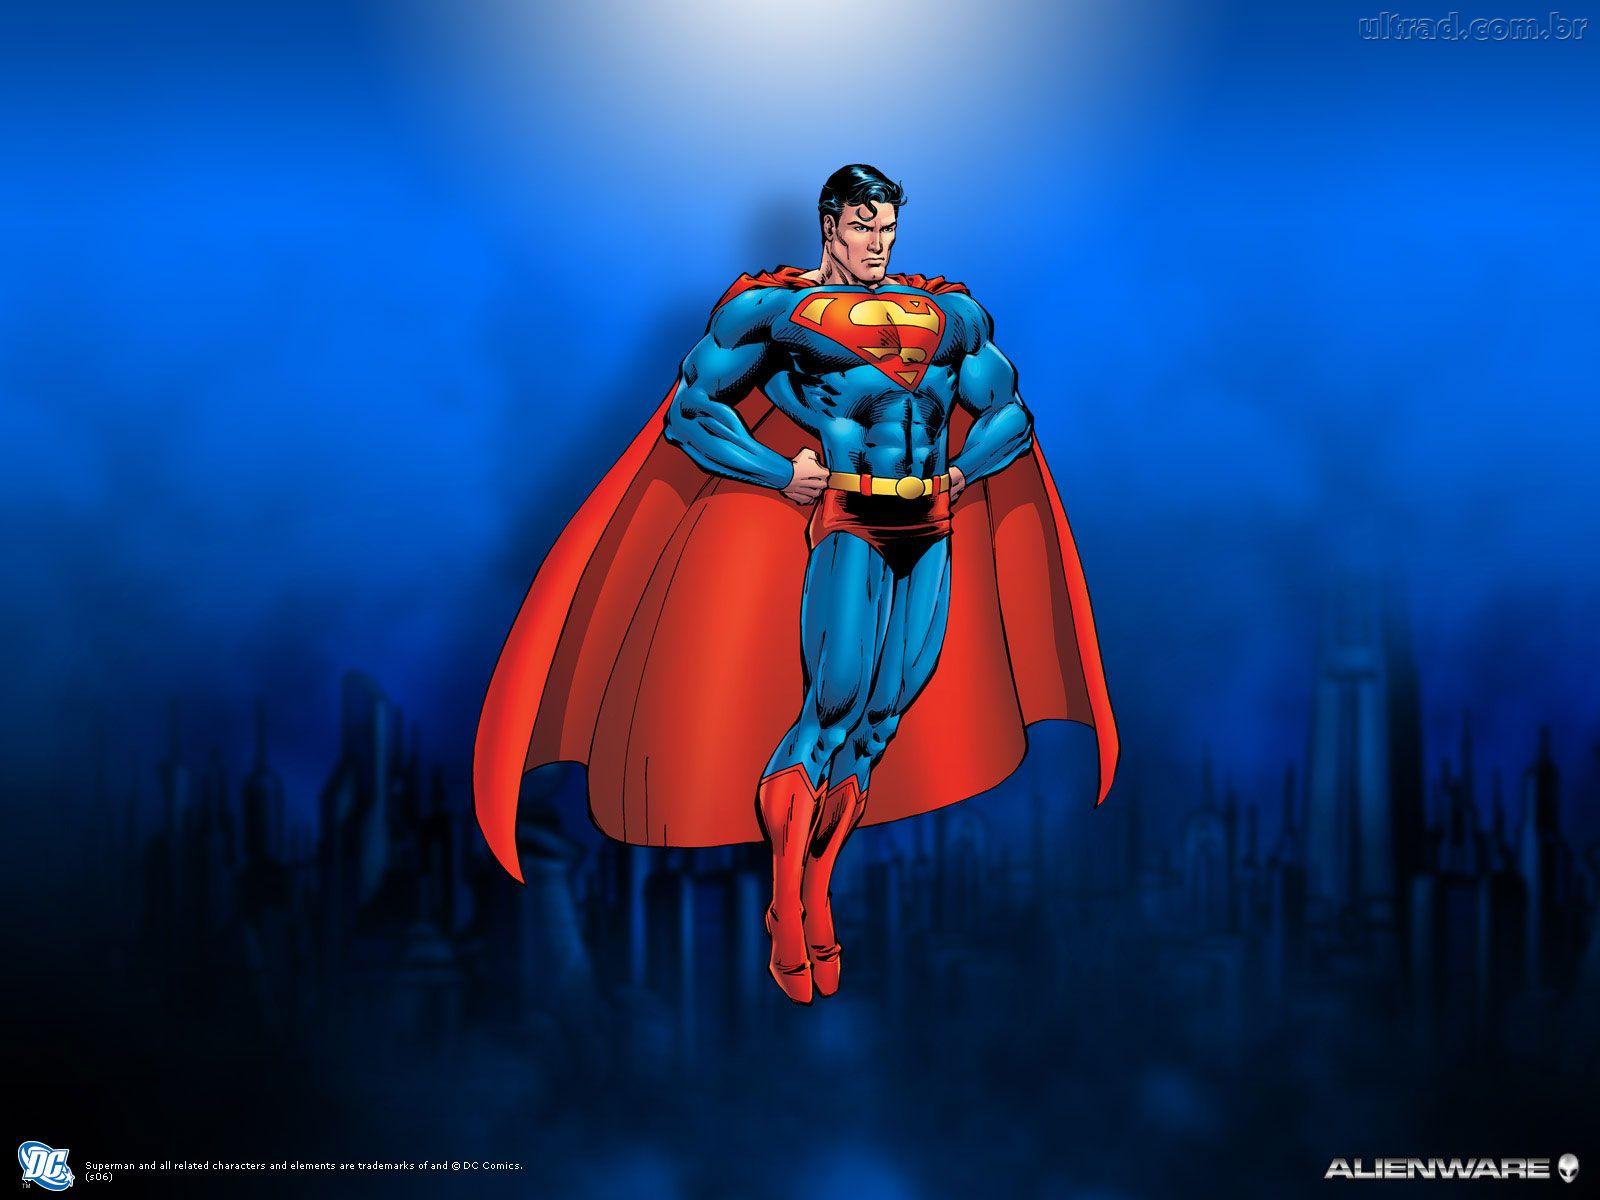 Superhero Wallpaper - Superhero